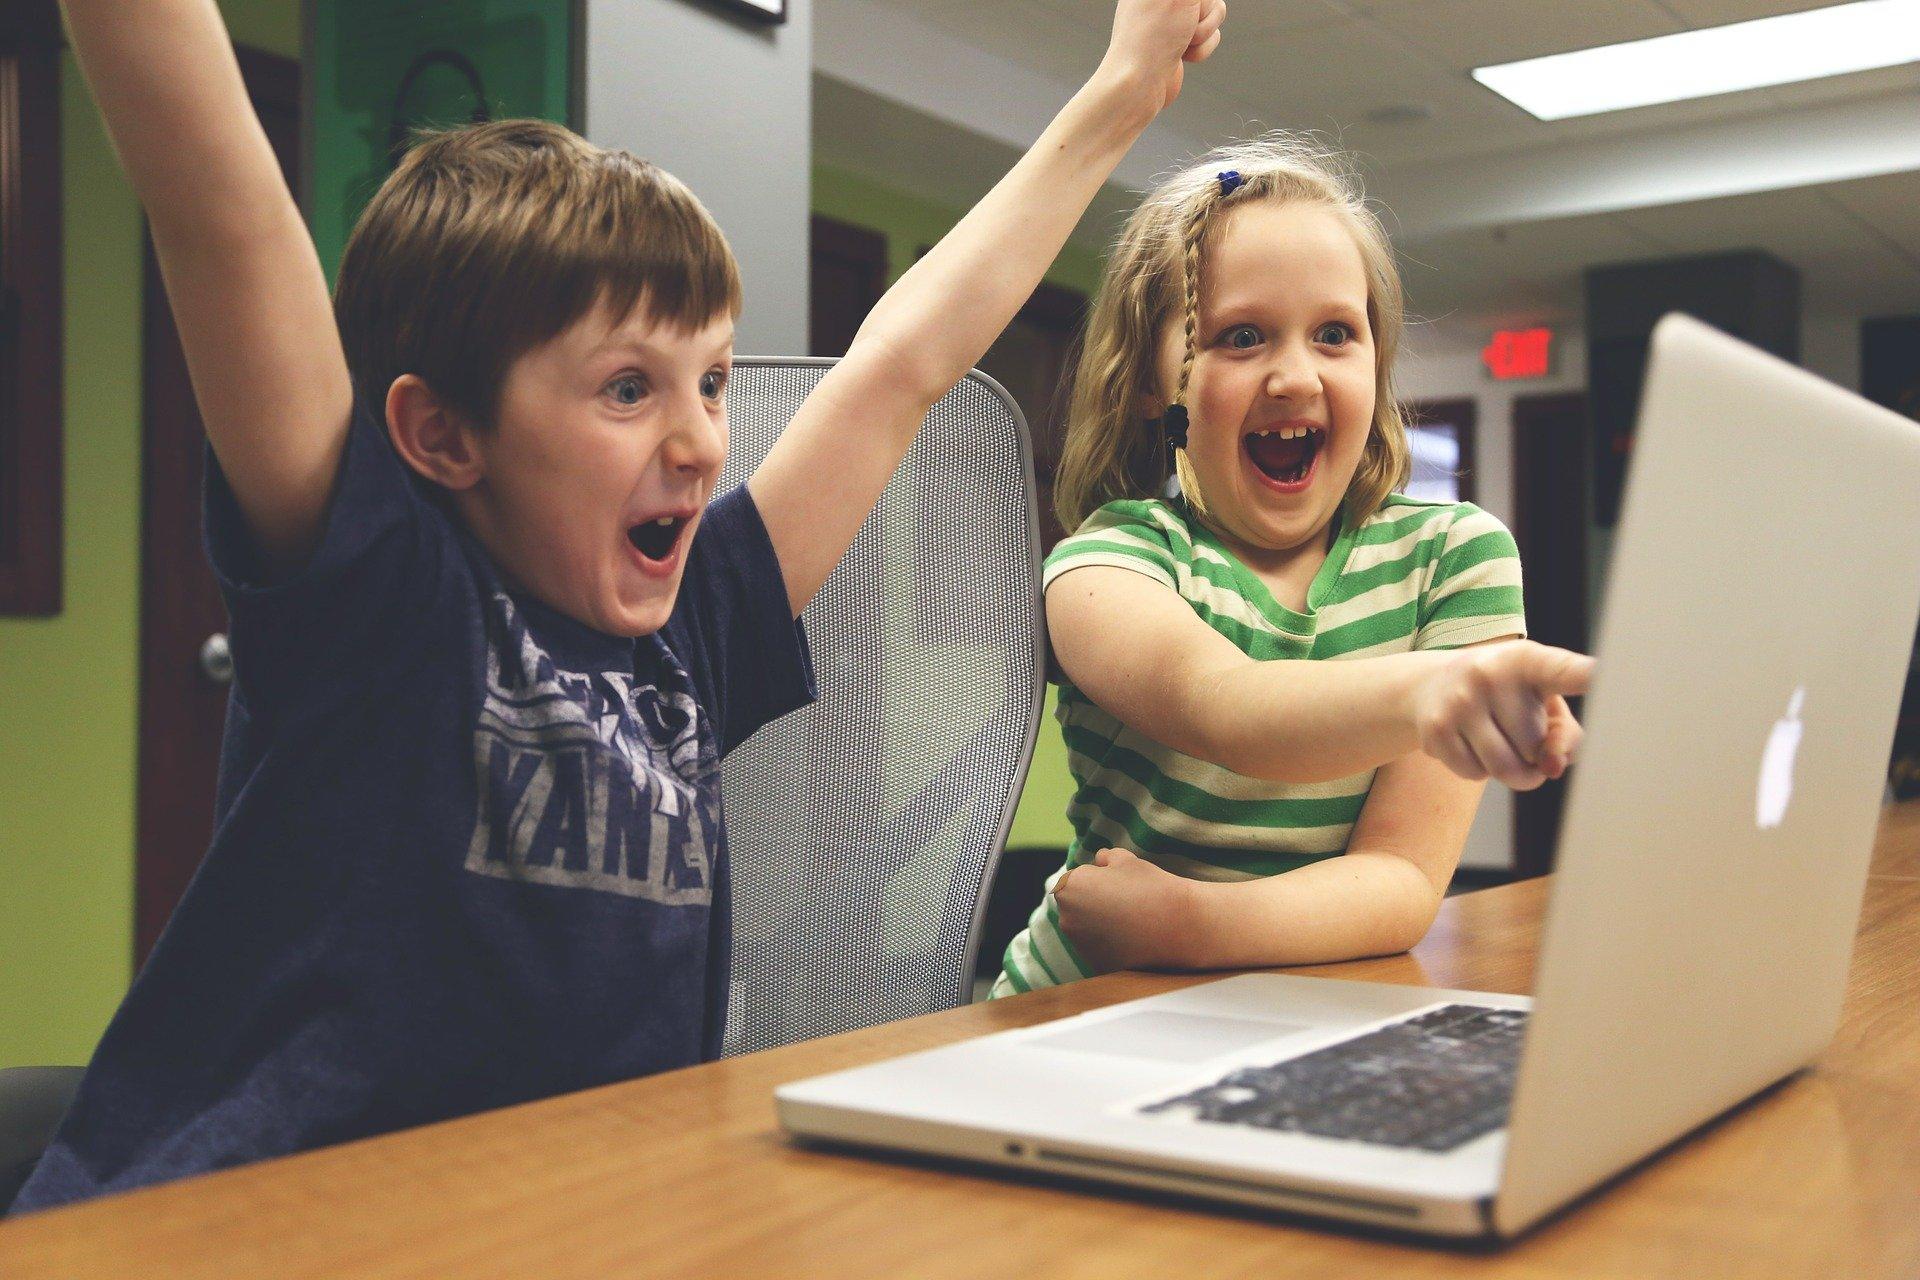 News aus dem Bereich der Soziallotterien: Bildungslotterie fördert zum 3. Mal mit schneller Corona-Direkthilfe